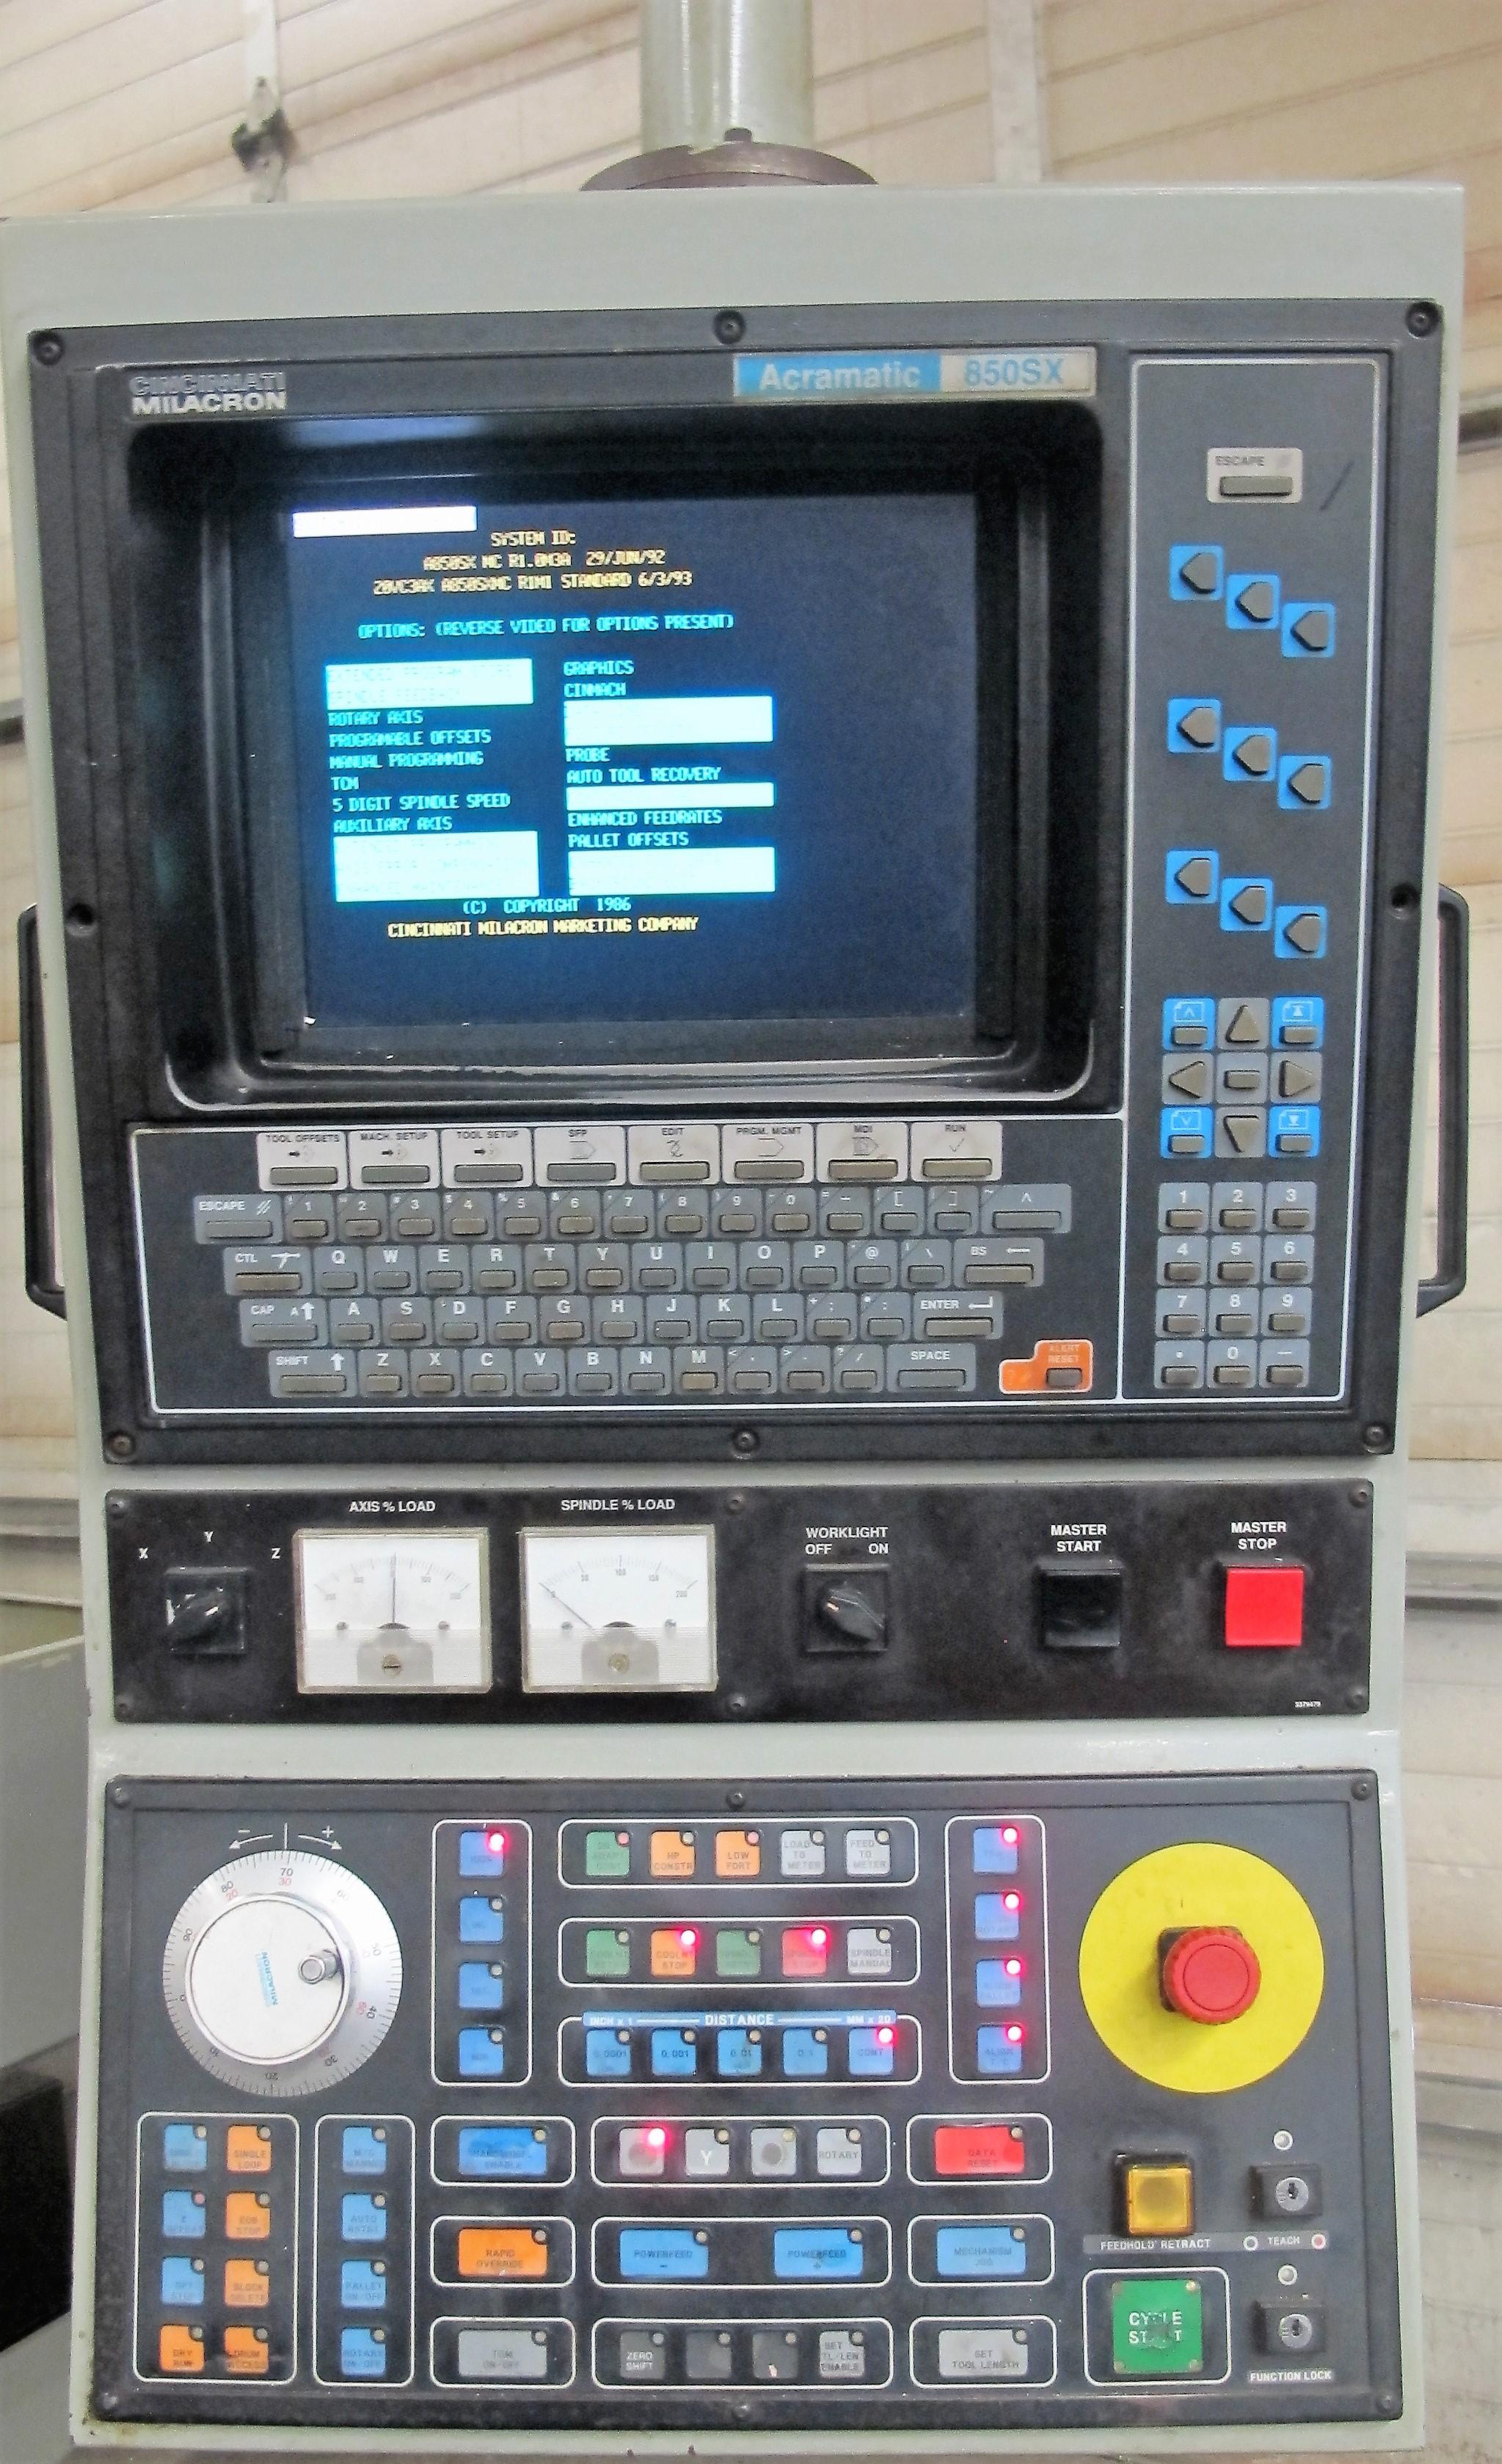 "CINCINNATI MILACRON20VC CNC VERTICAL MILLING MACHINING, 80"" x 30"" TABLE, ACRAMATIC 850SX CNC - Image 6 of 20"